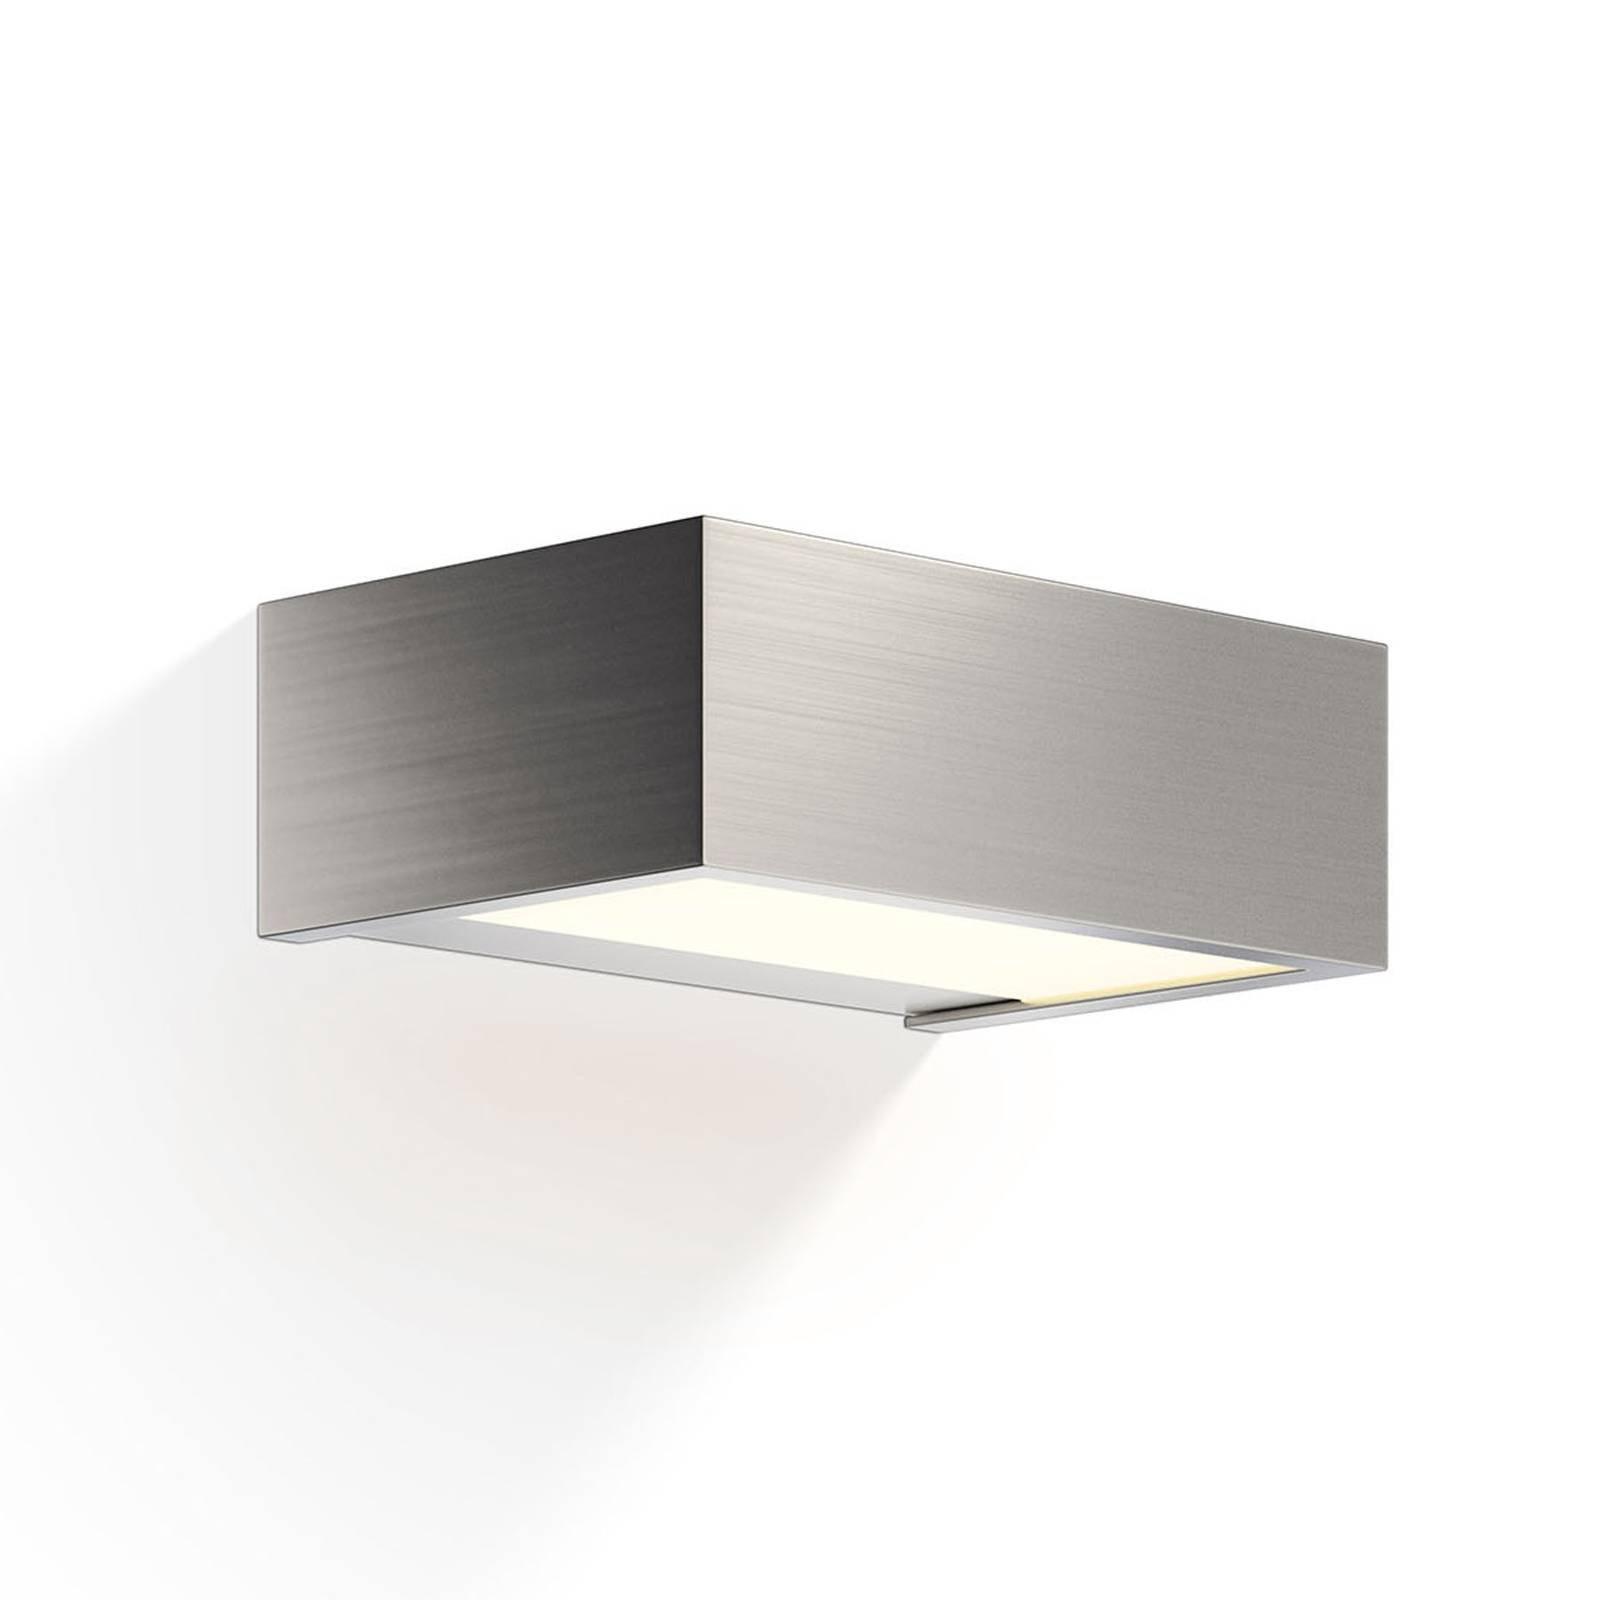 Decor Walther Box LED-vegglampe nikkel 2700 K 15cm